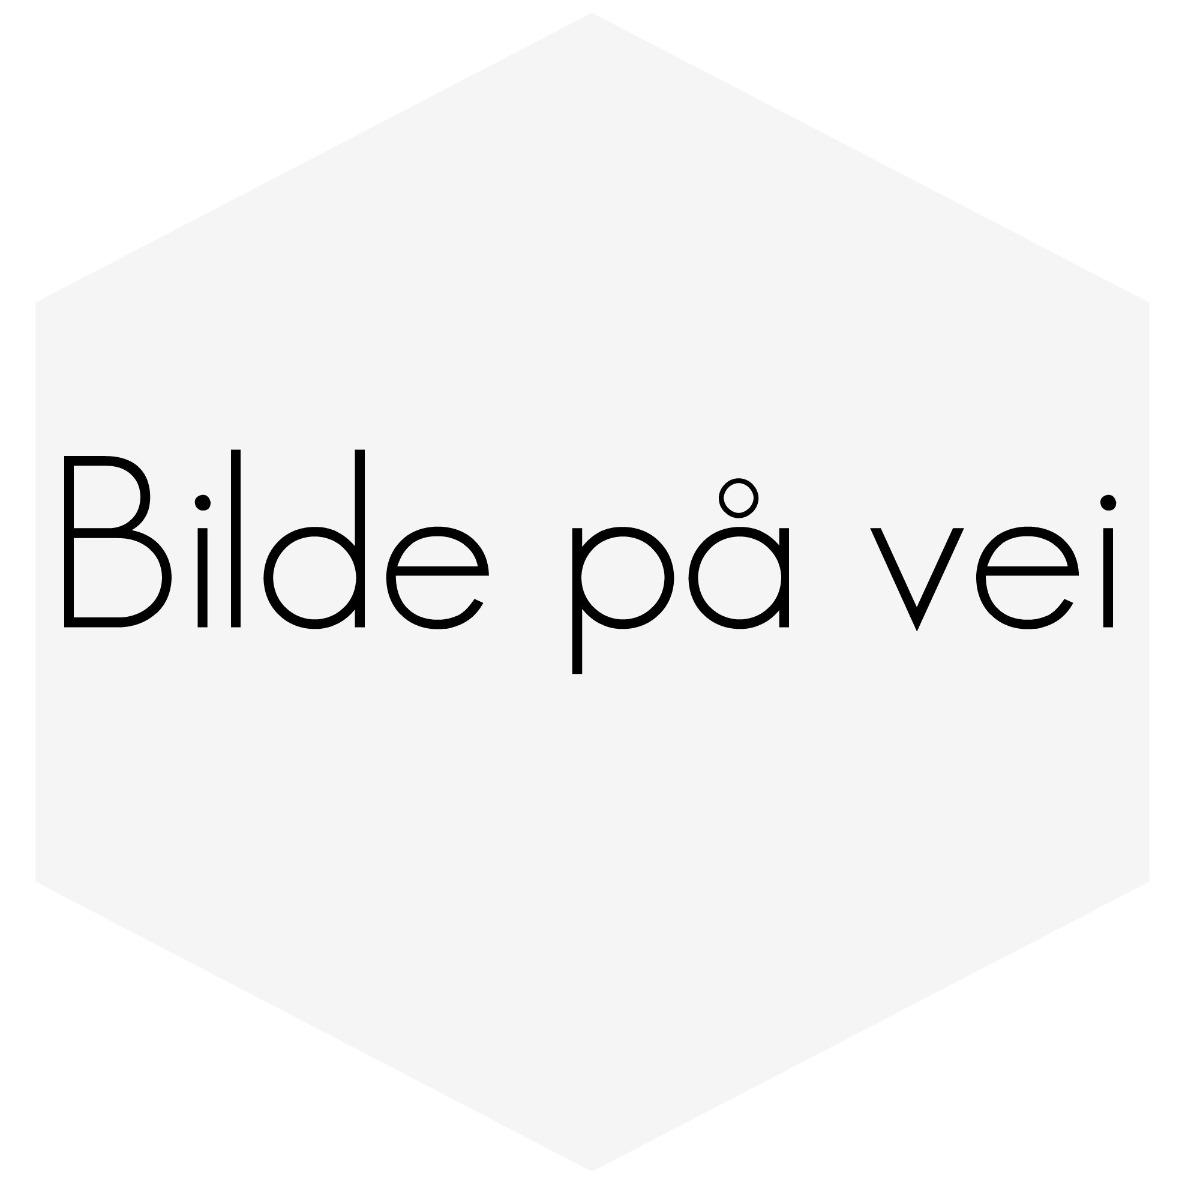 EXTRAKTORGRENRØR B18/20 STEG 1-2 TRIMMING